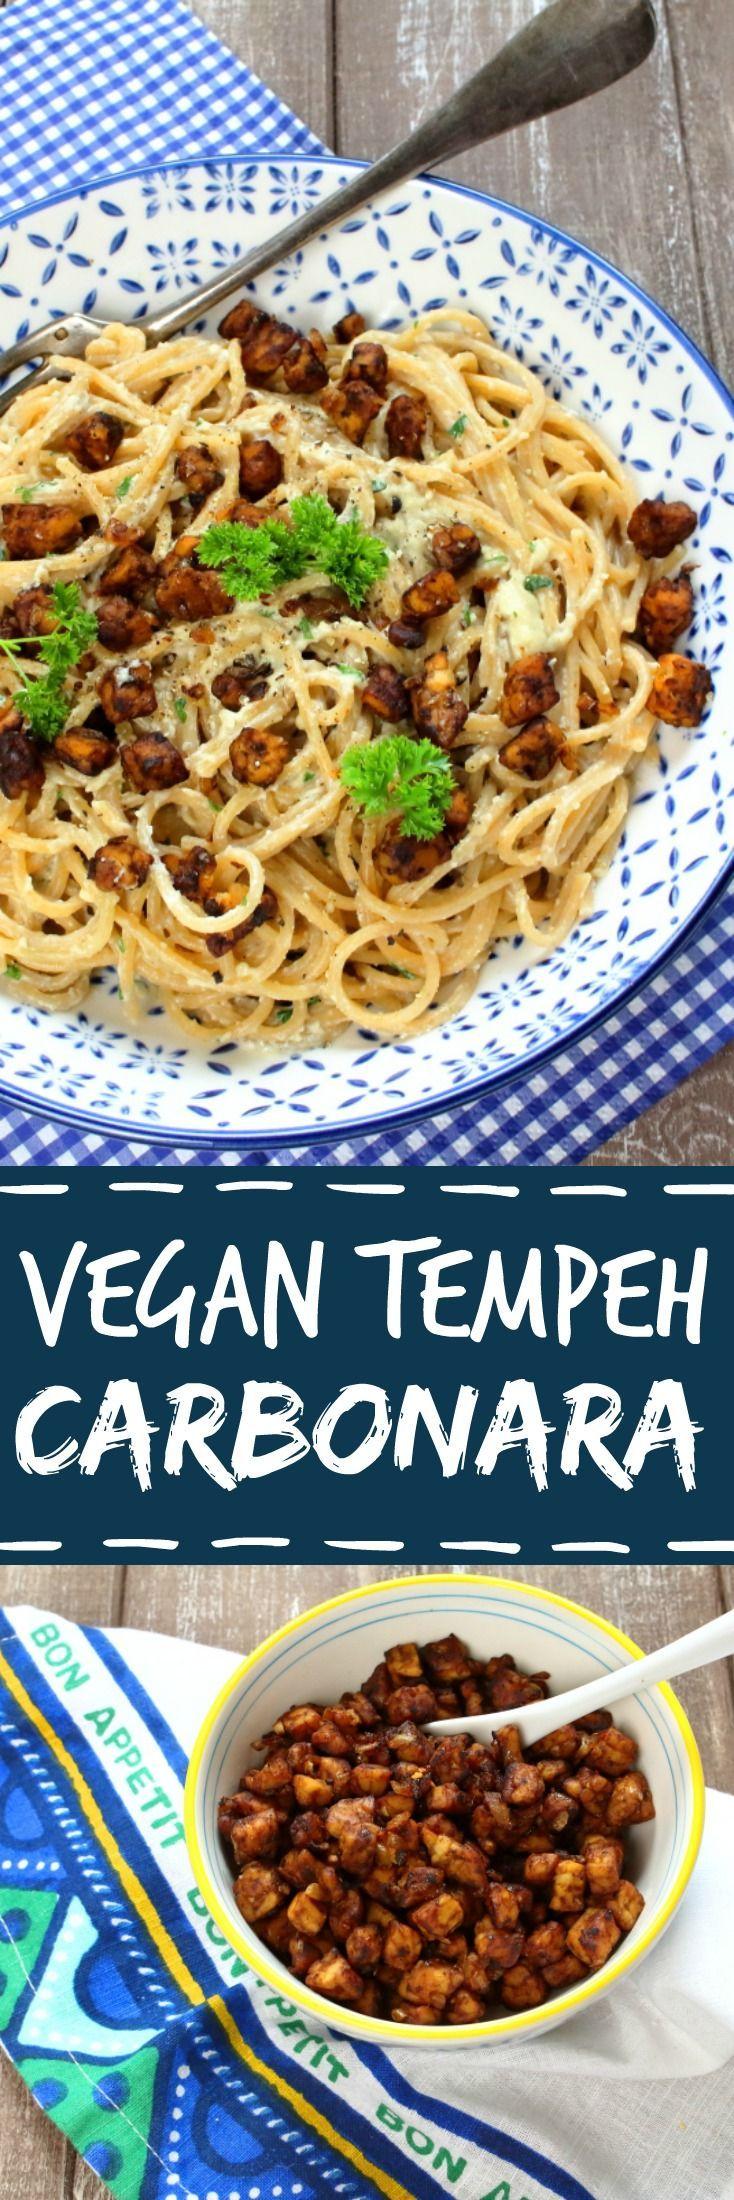 Vegan Tempeh Carbonara with Spaghetti. Super creamy and crispy!  | healthy recipe ideas @xhealthyrecipex |